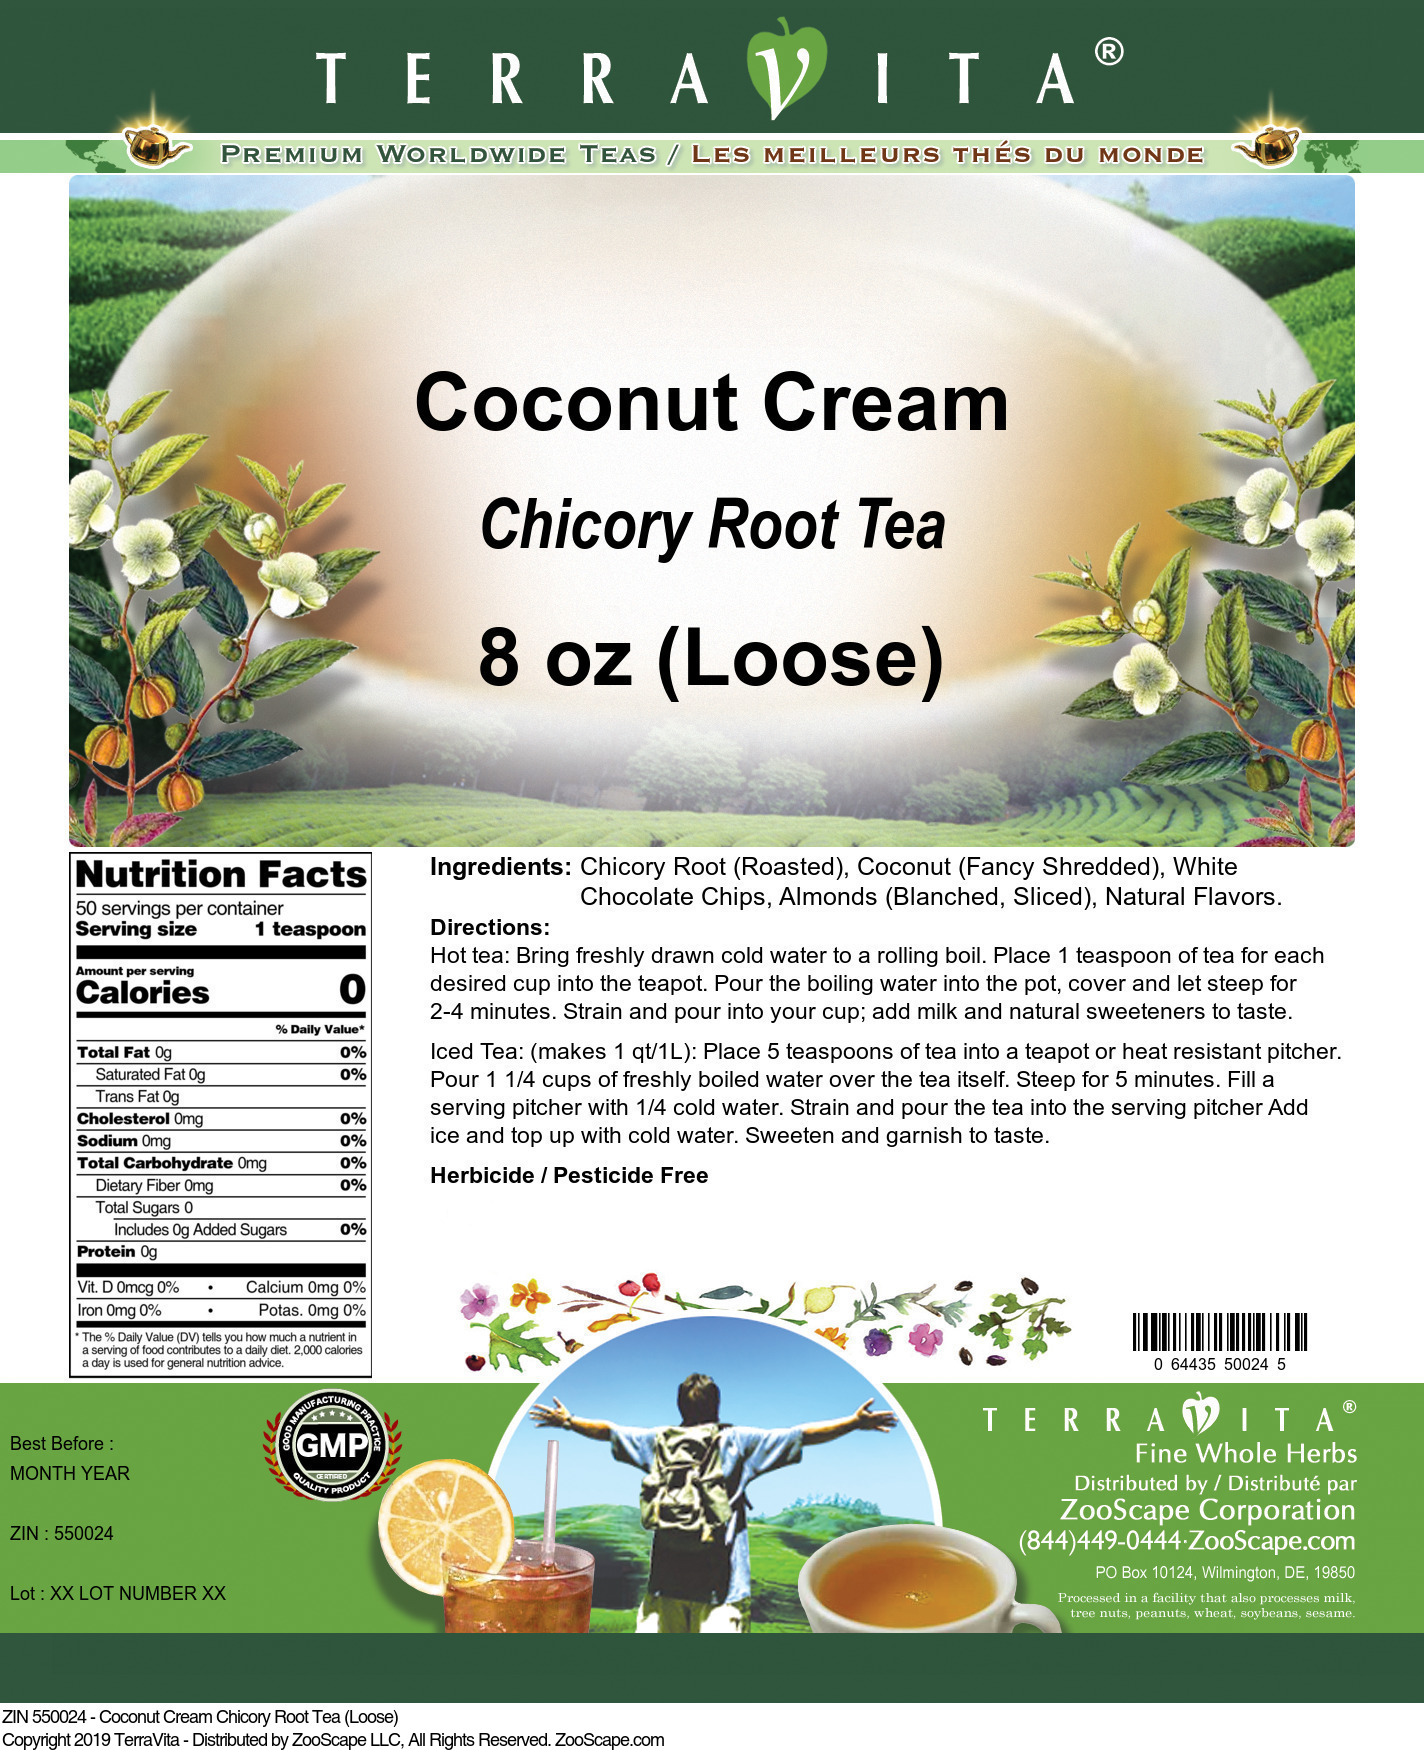 Coconut Cream Chicory Root